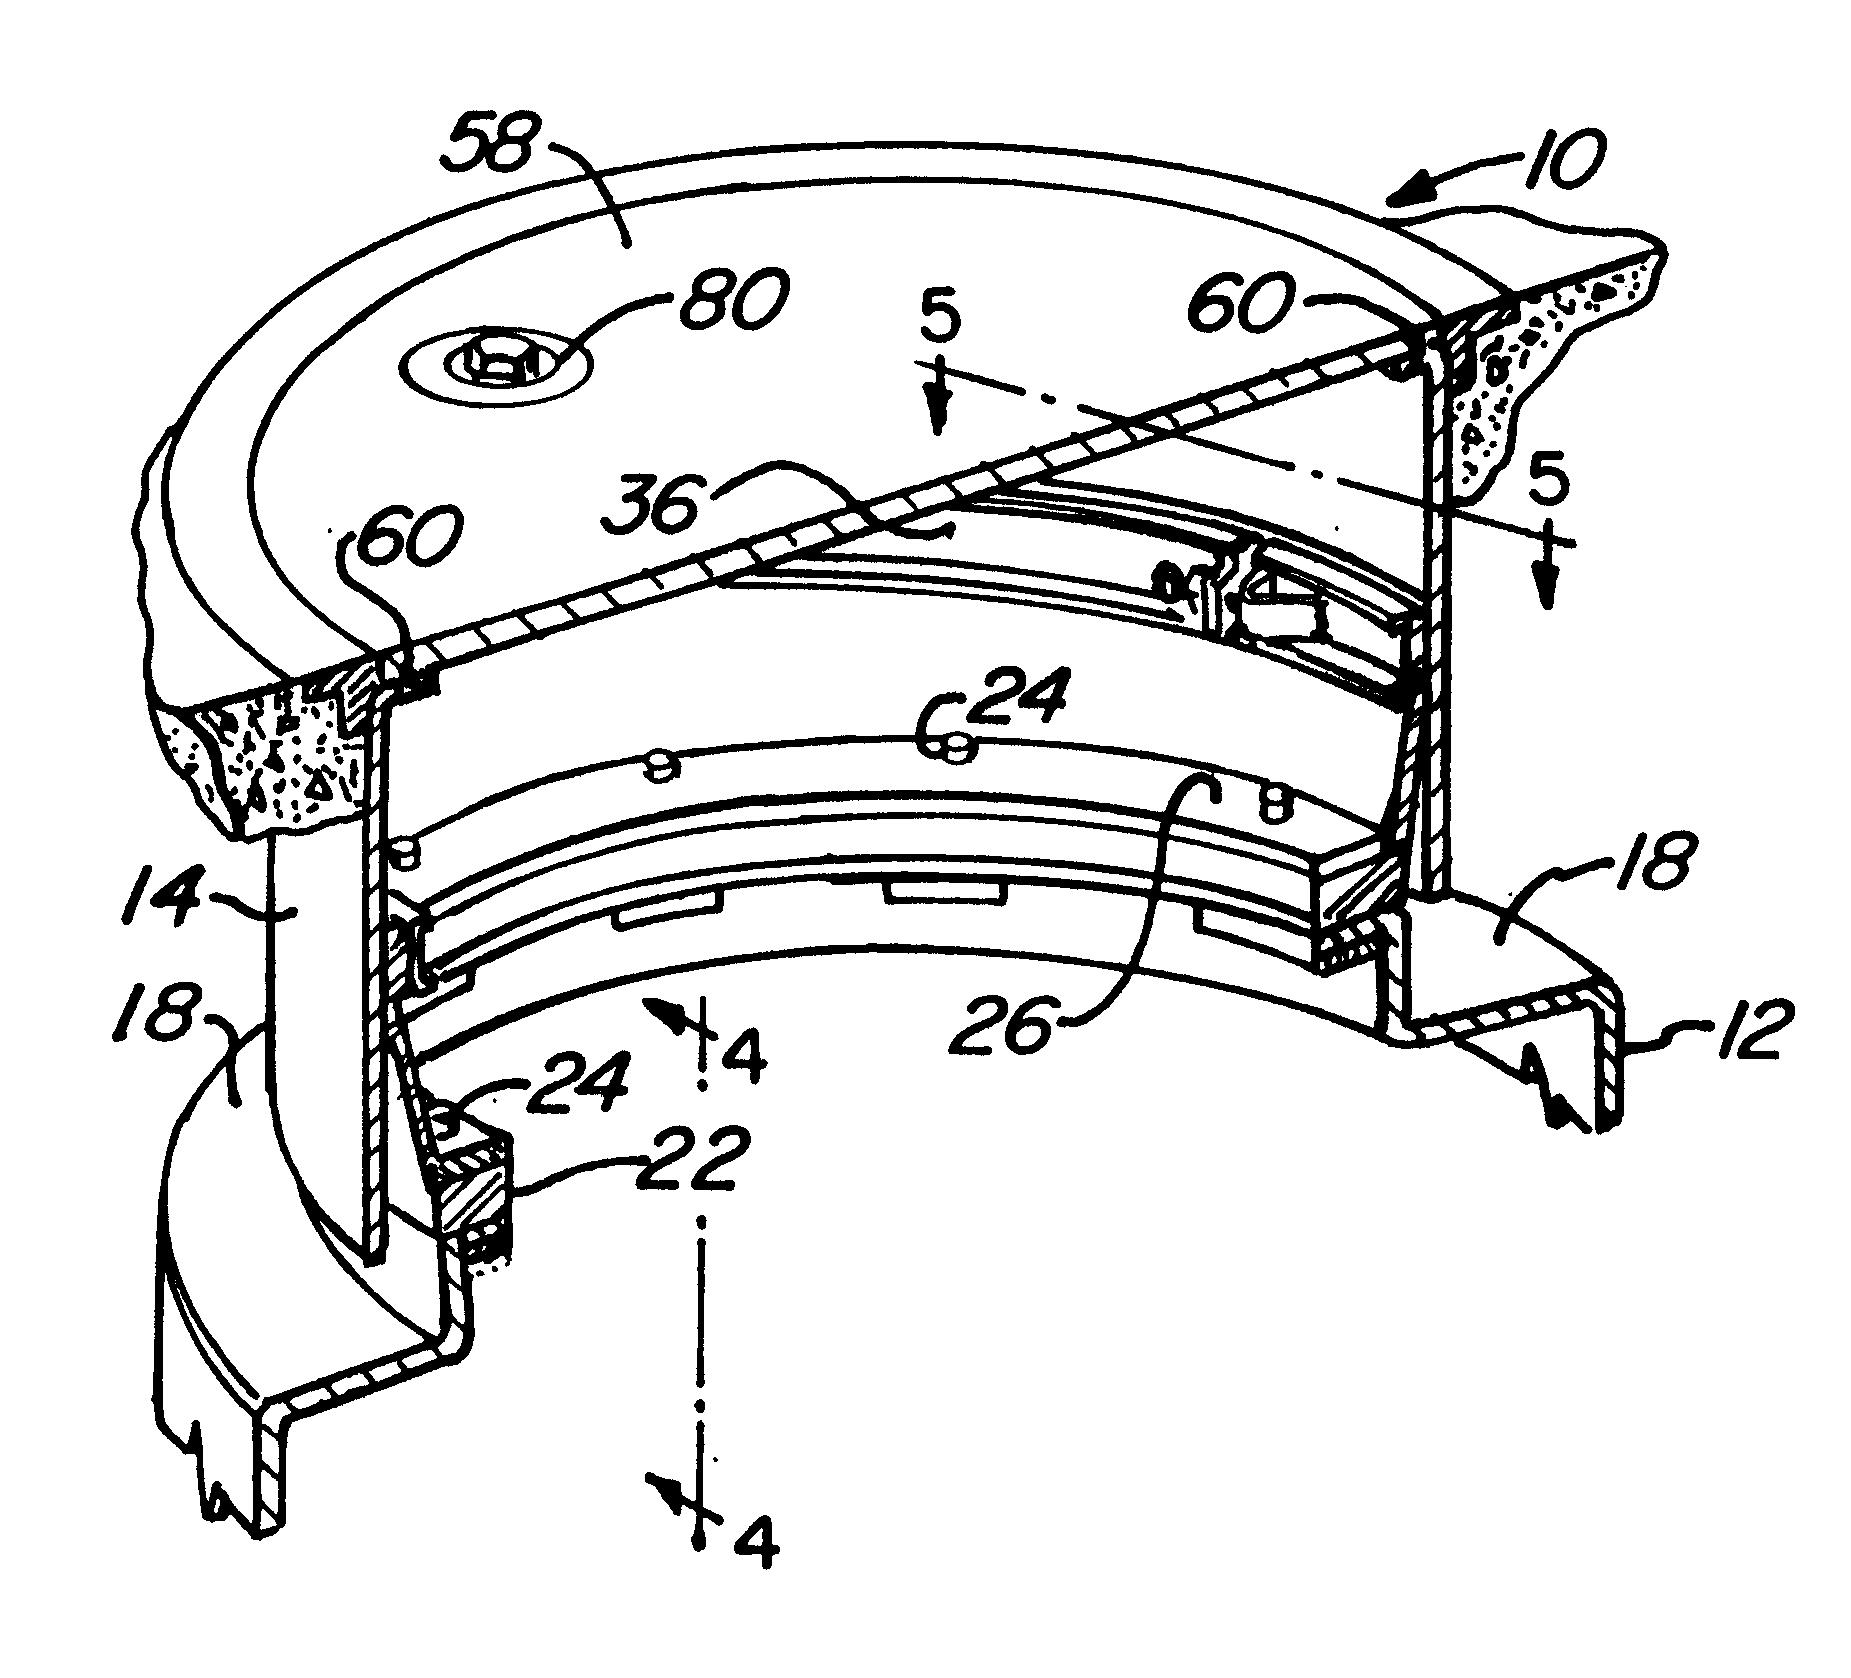 tags: #dt466e engine parts diagram#1992 international 4700 wiring diagram# international 4700 wiring diagram#international 4300 wiring diagram fuel